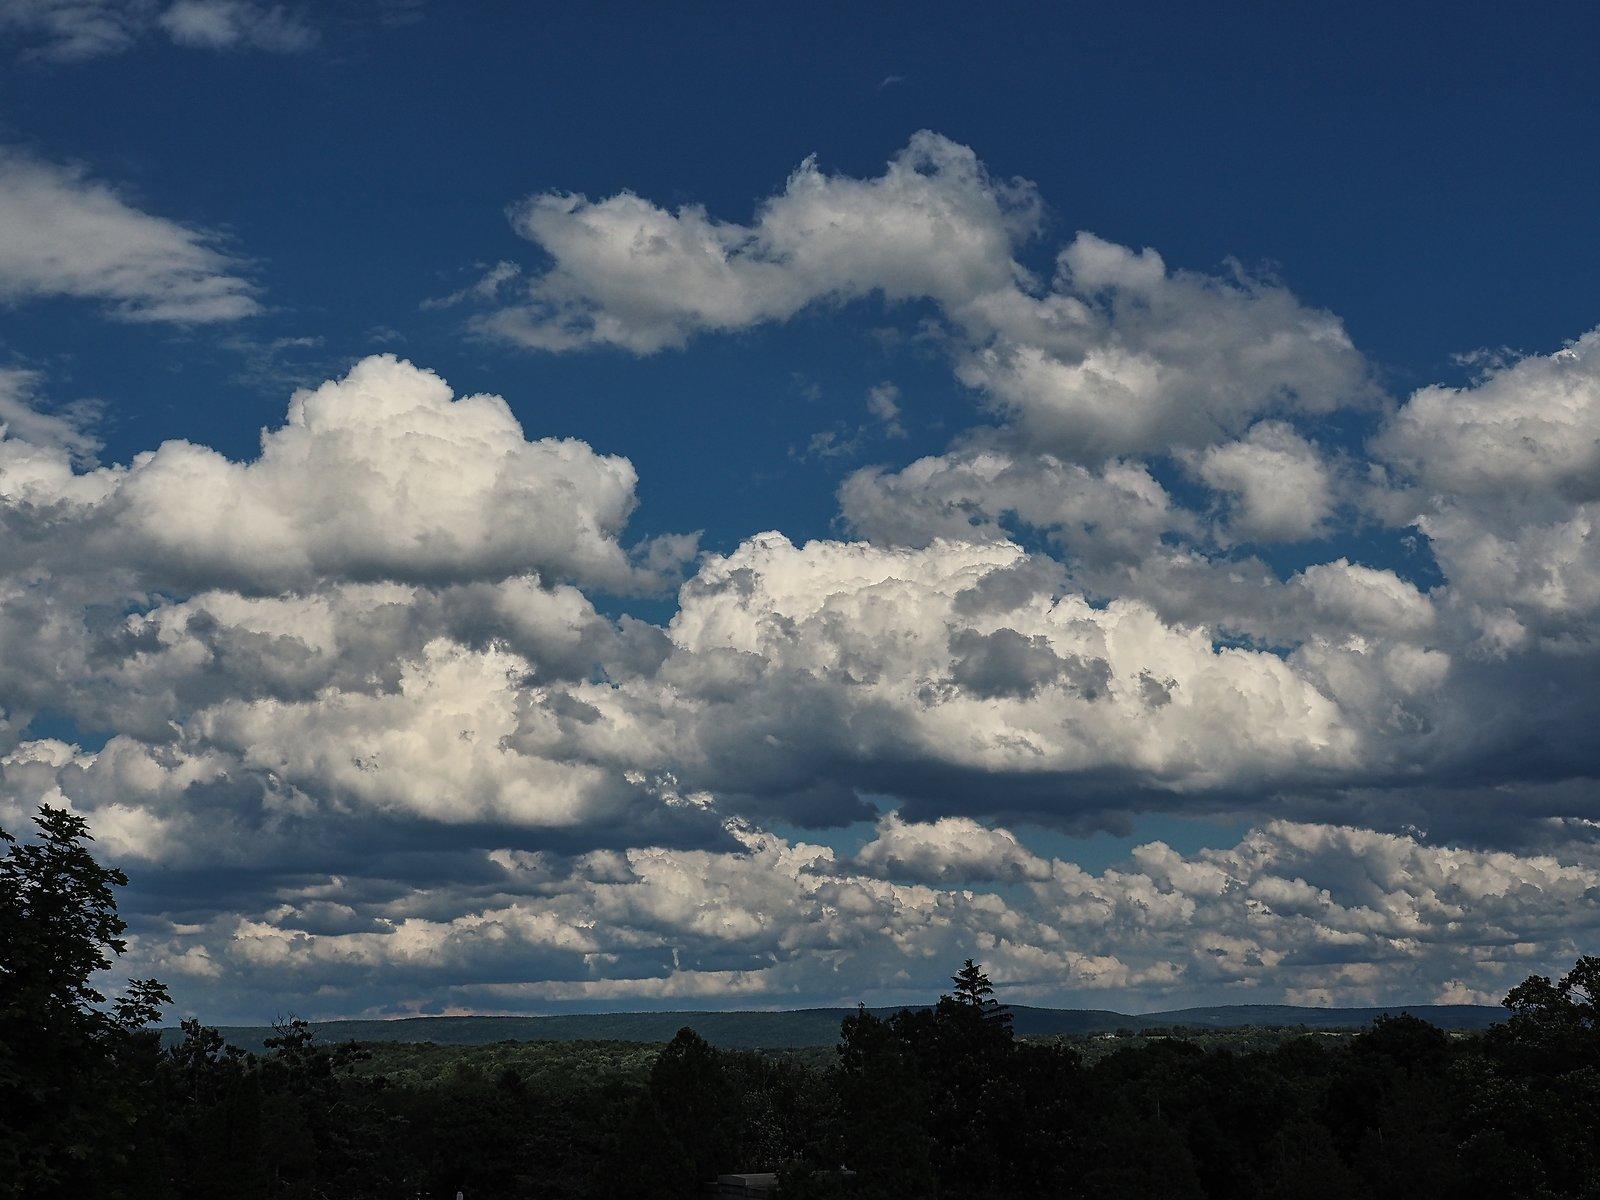 OMD EM5 2 clouds 002 B.jpg